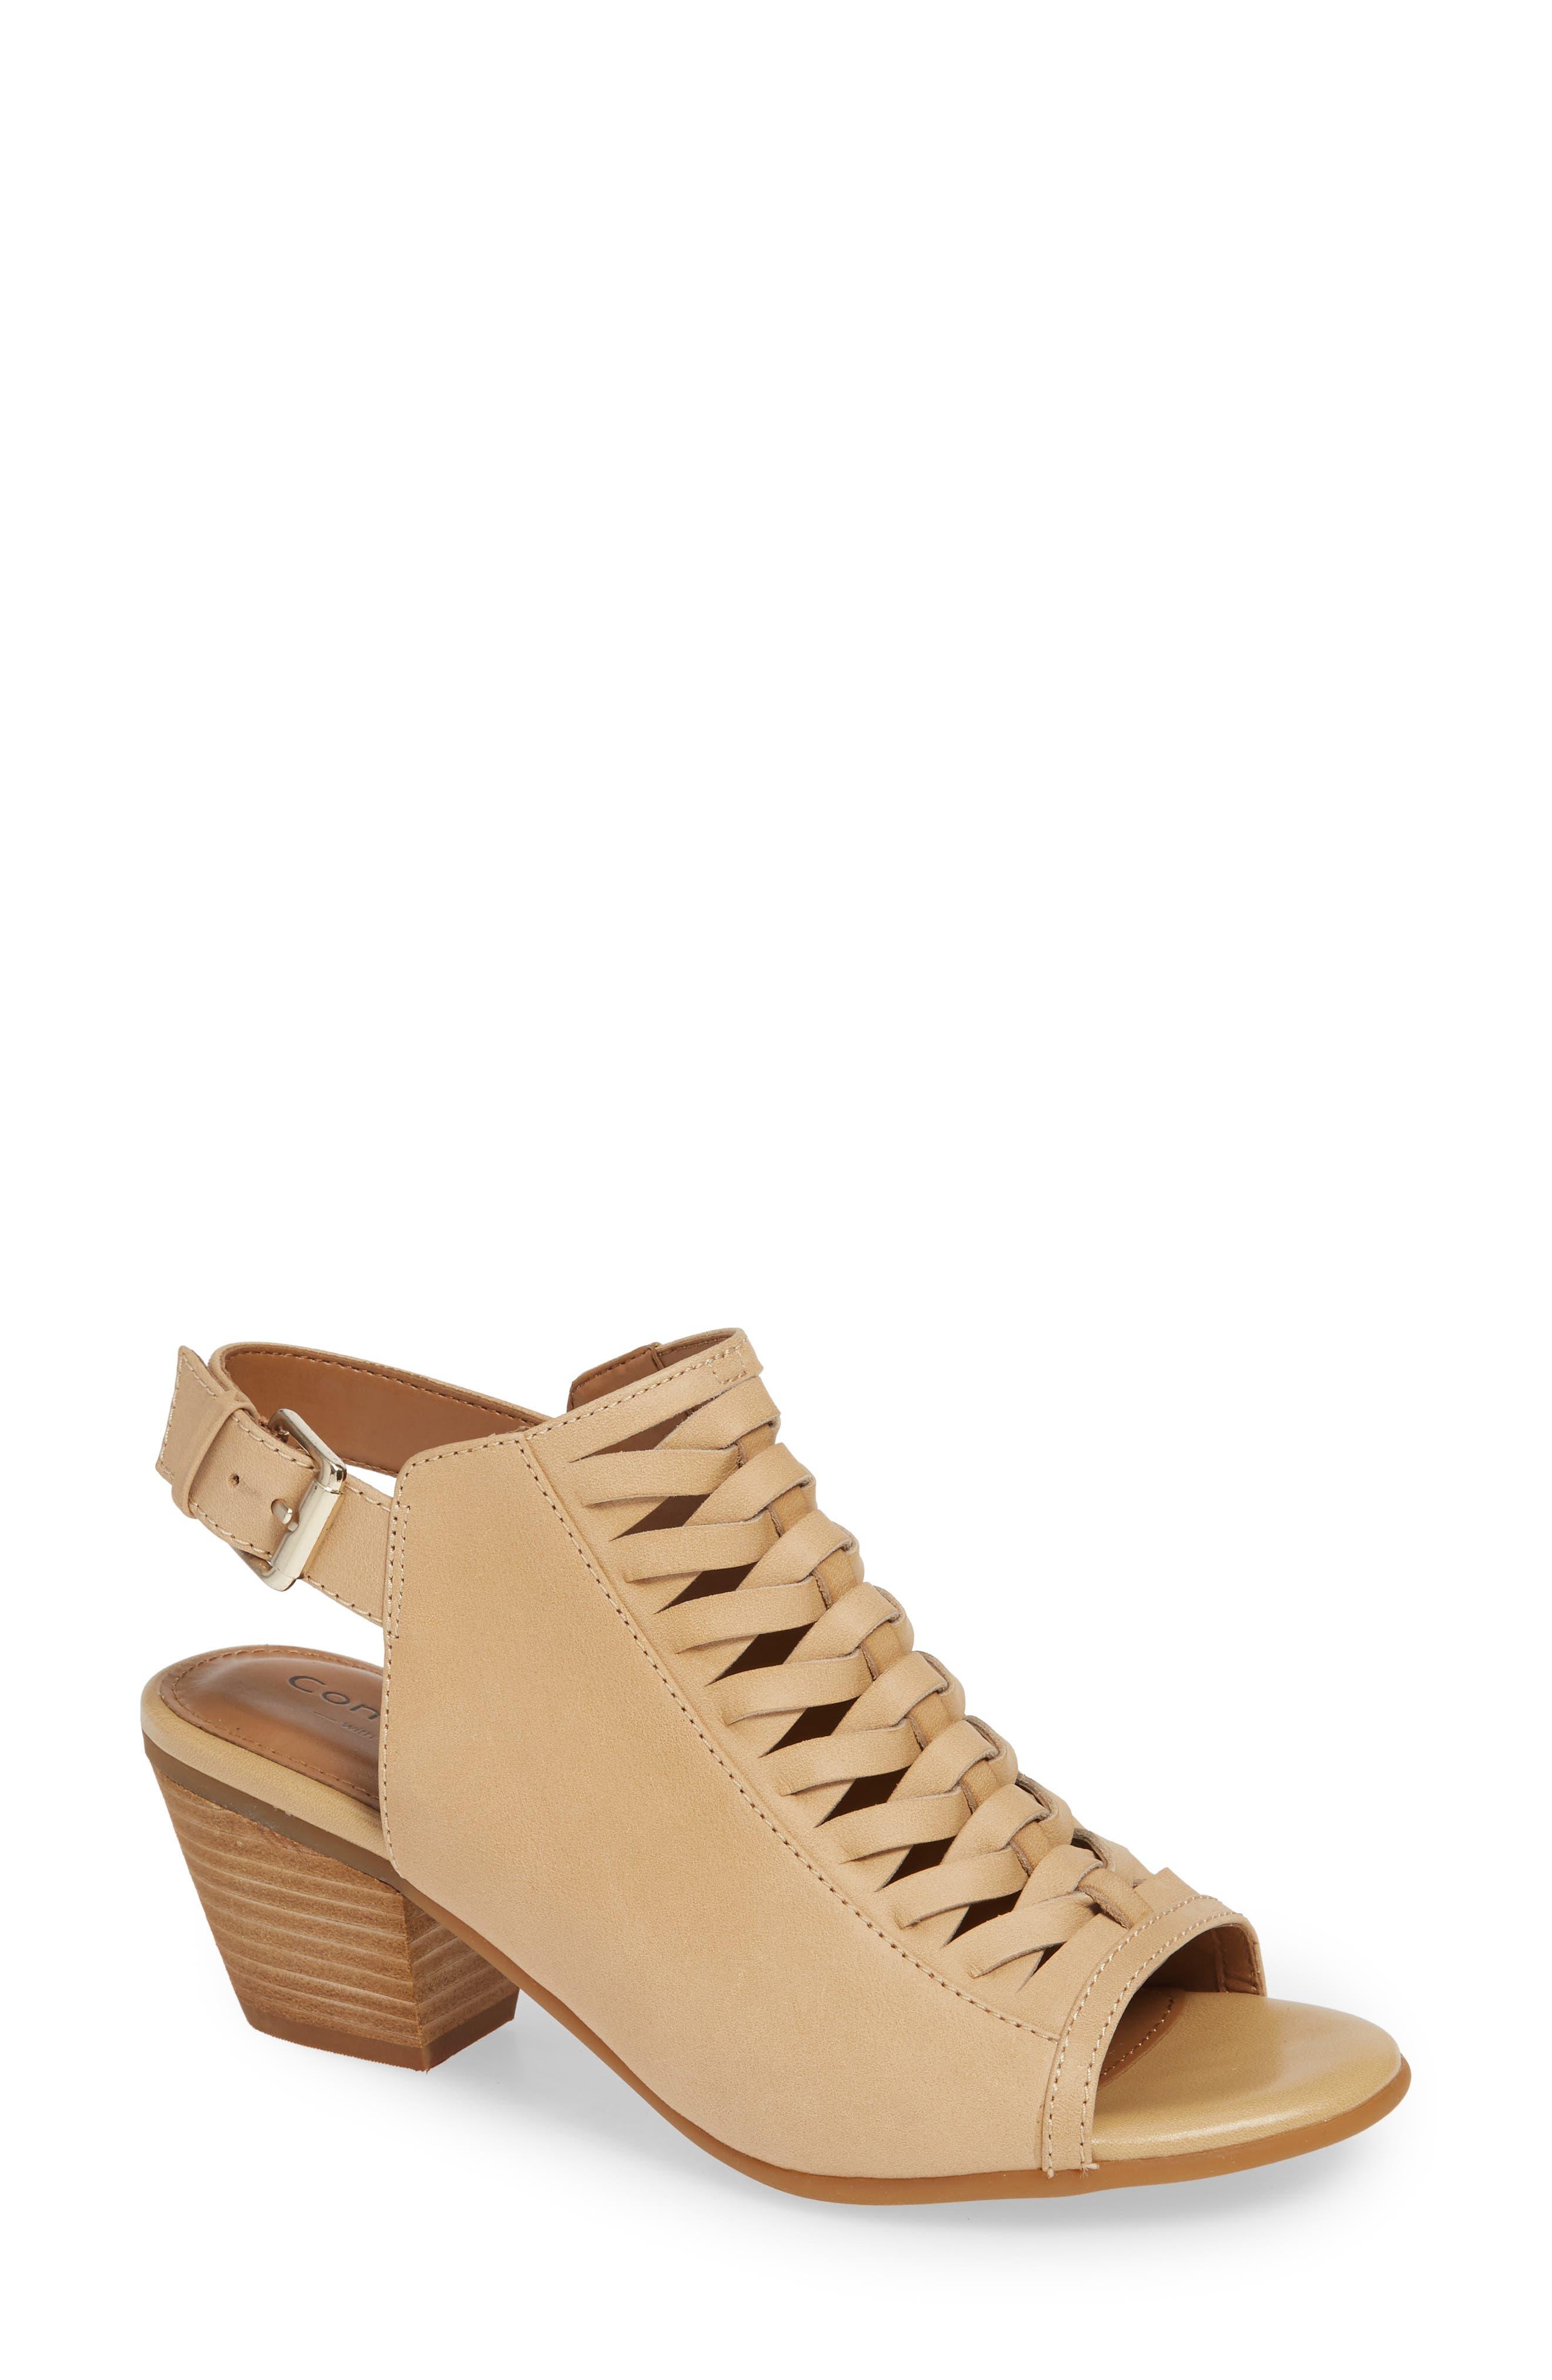 Comfortiva Alanna Leather Sandal, Beige